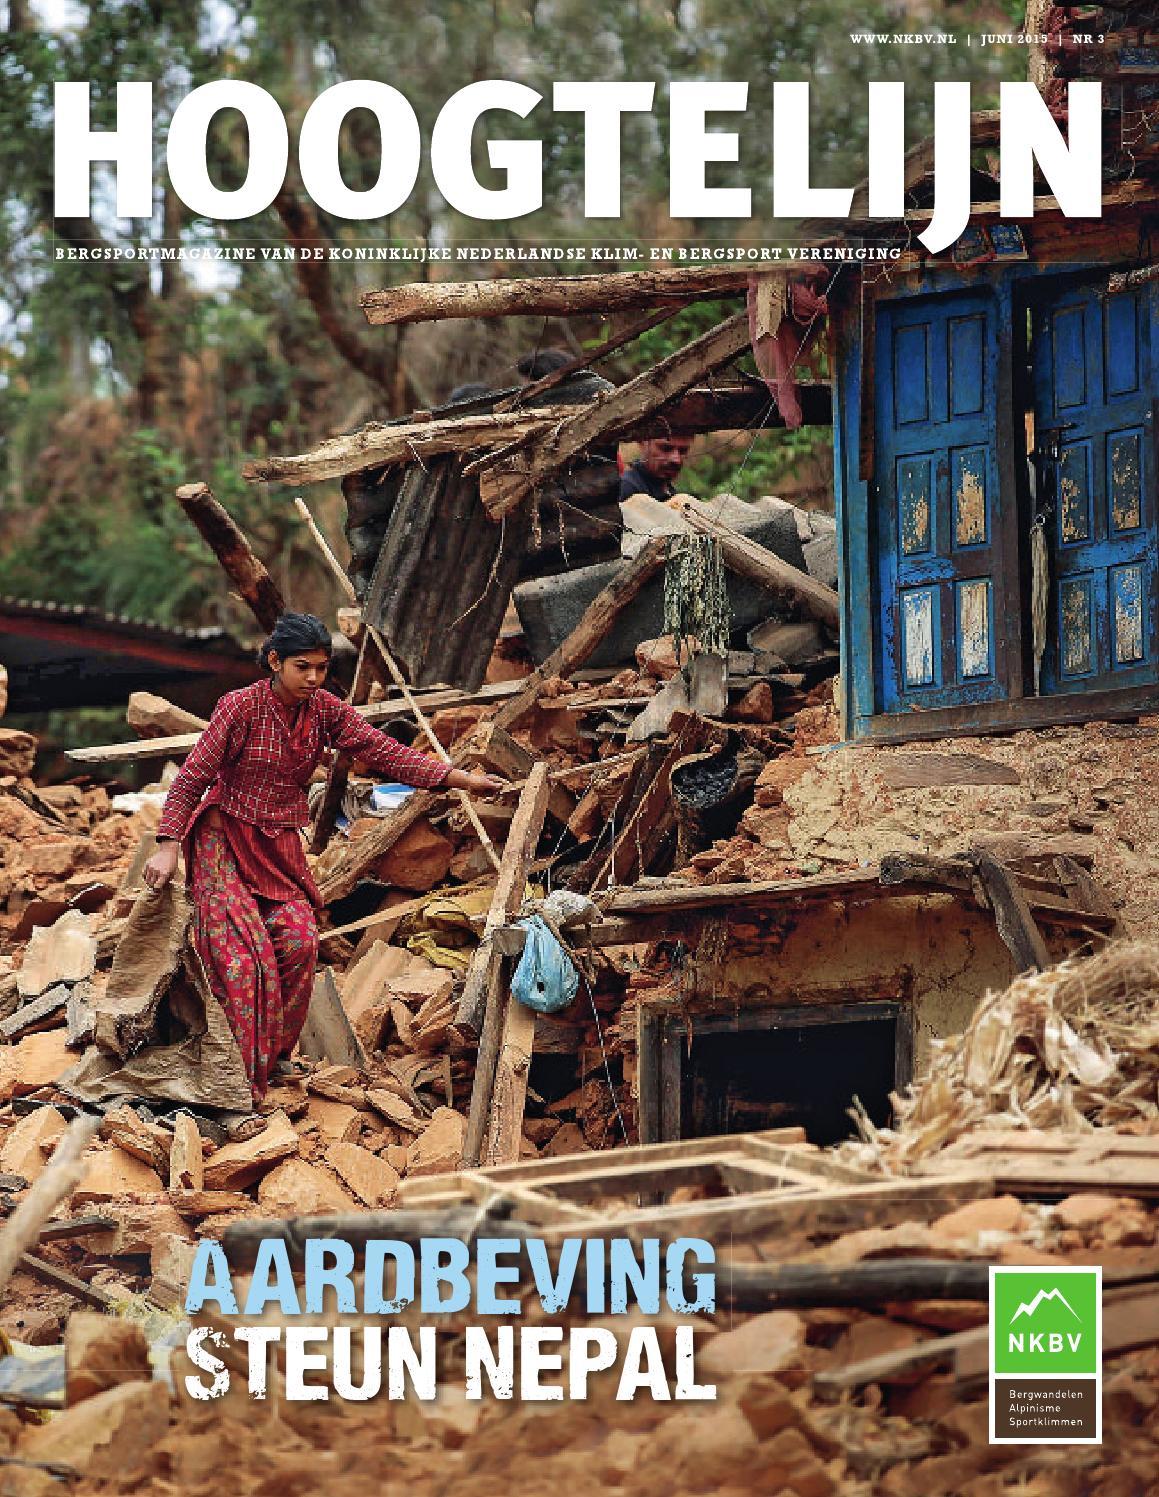 Hoogtelijn 5/2016 by Koninklijke NKBV - issuu